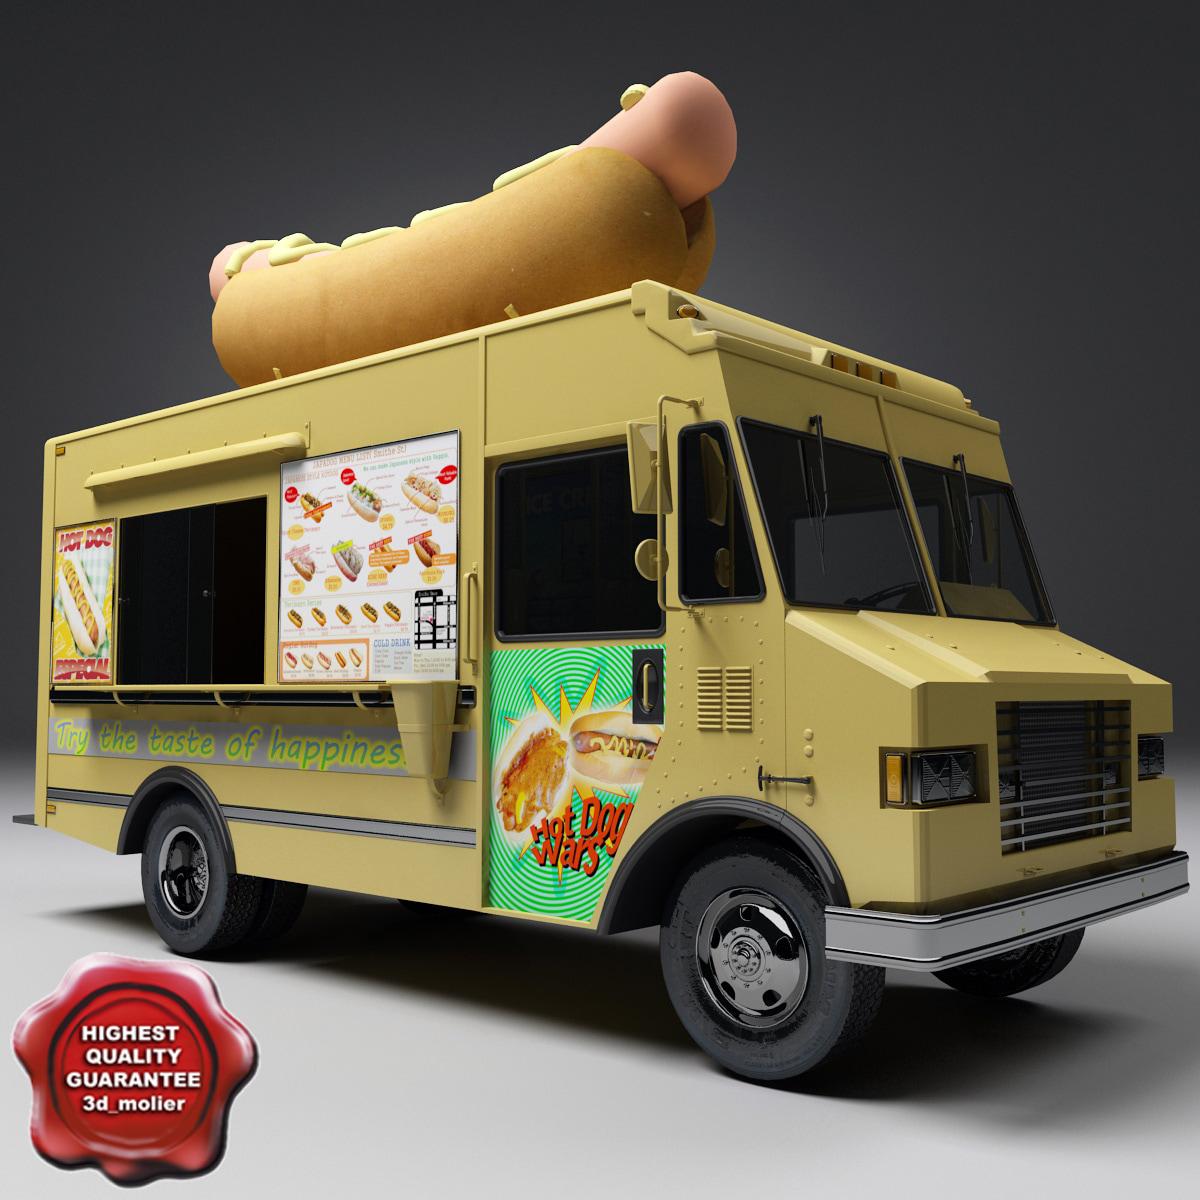 Urban Hotdog Food Truck